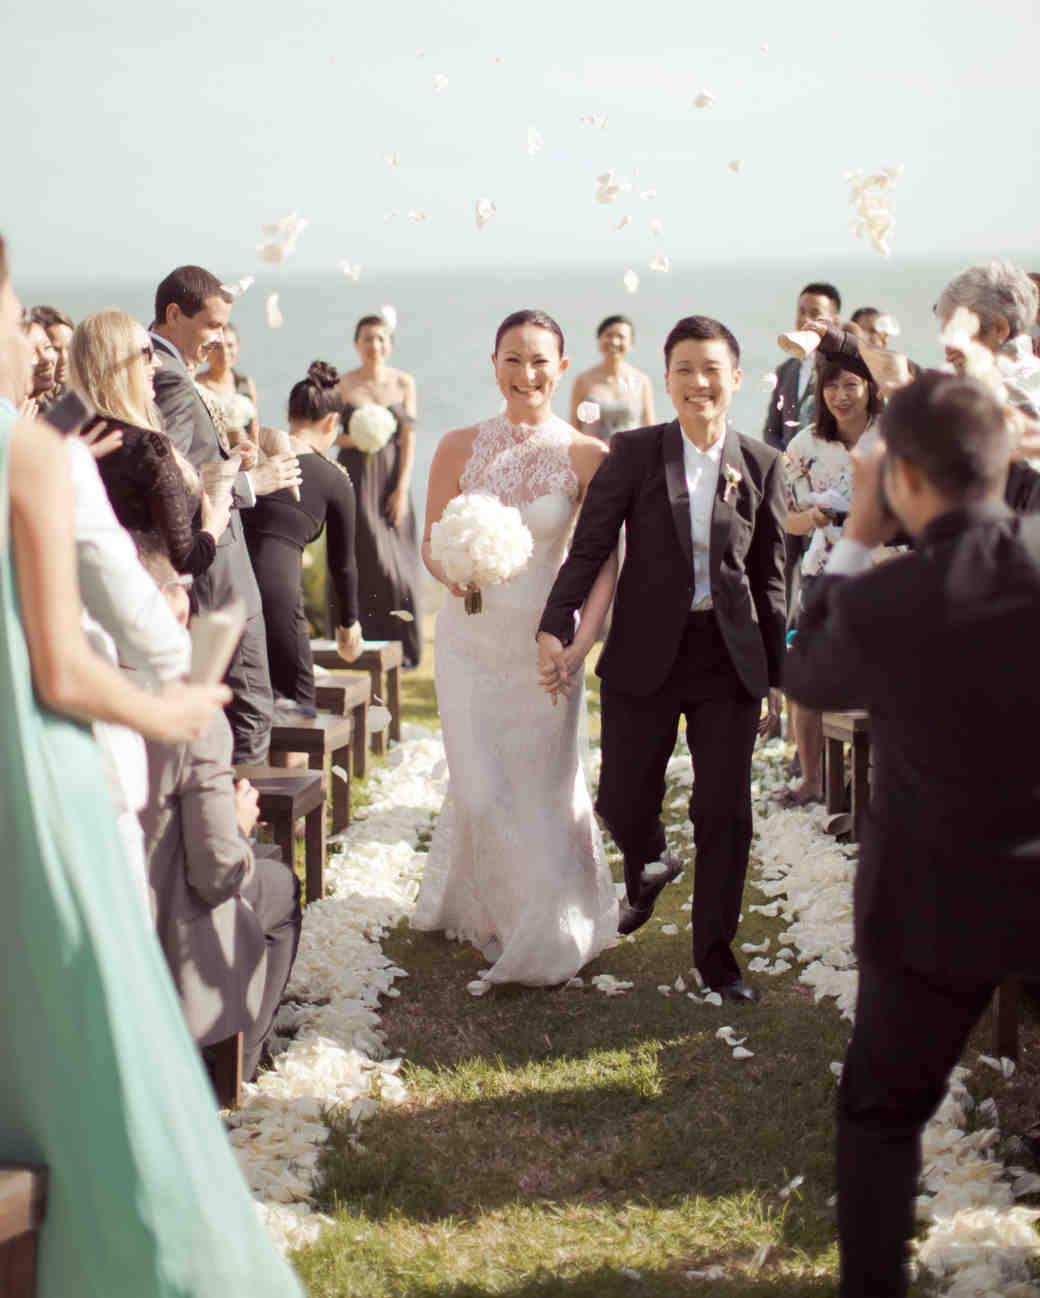 emma-michelle-wedding-petaltoss-0701-s112079-0715.jpg